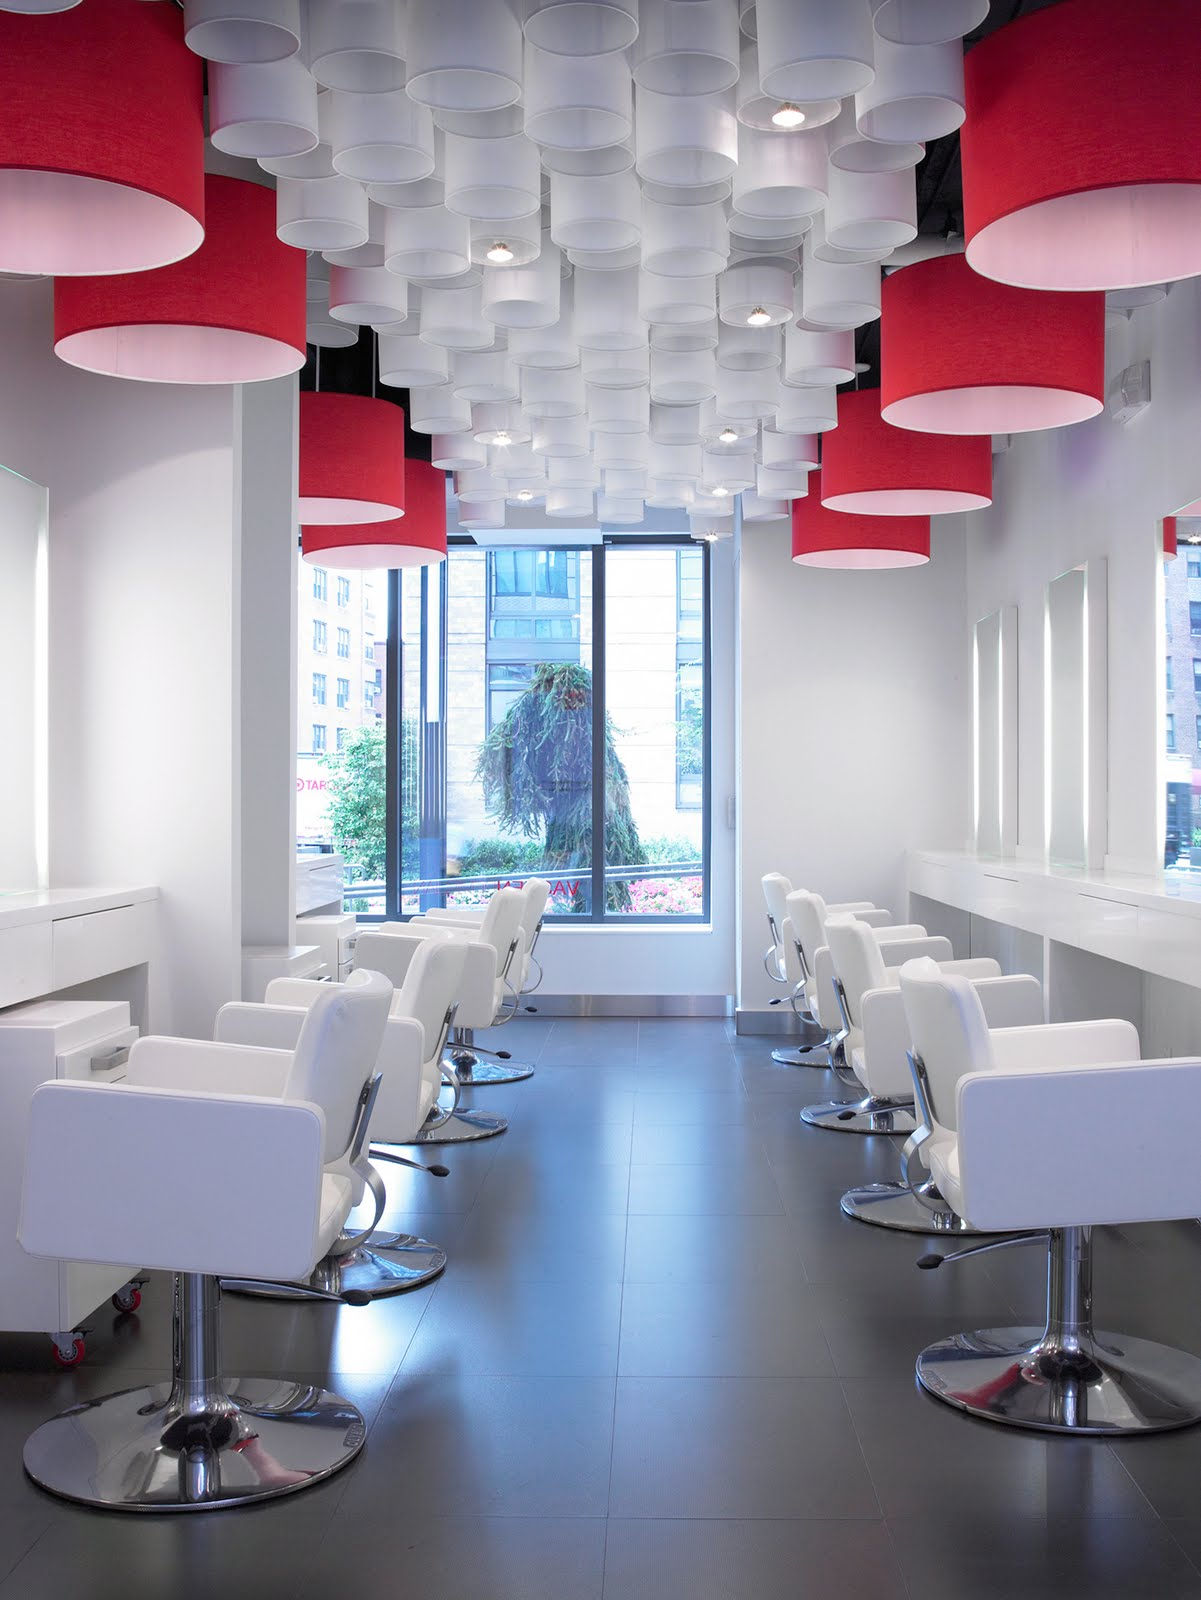 The professional beauty association 2010 north american for Mizu hair salon nyc